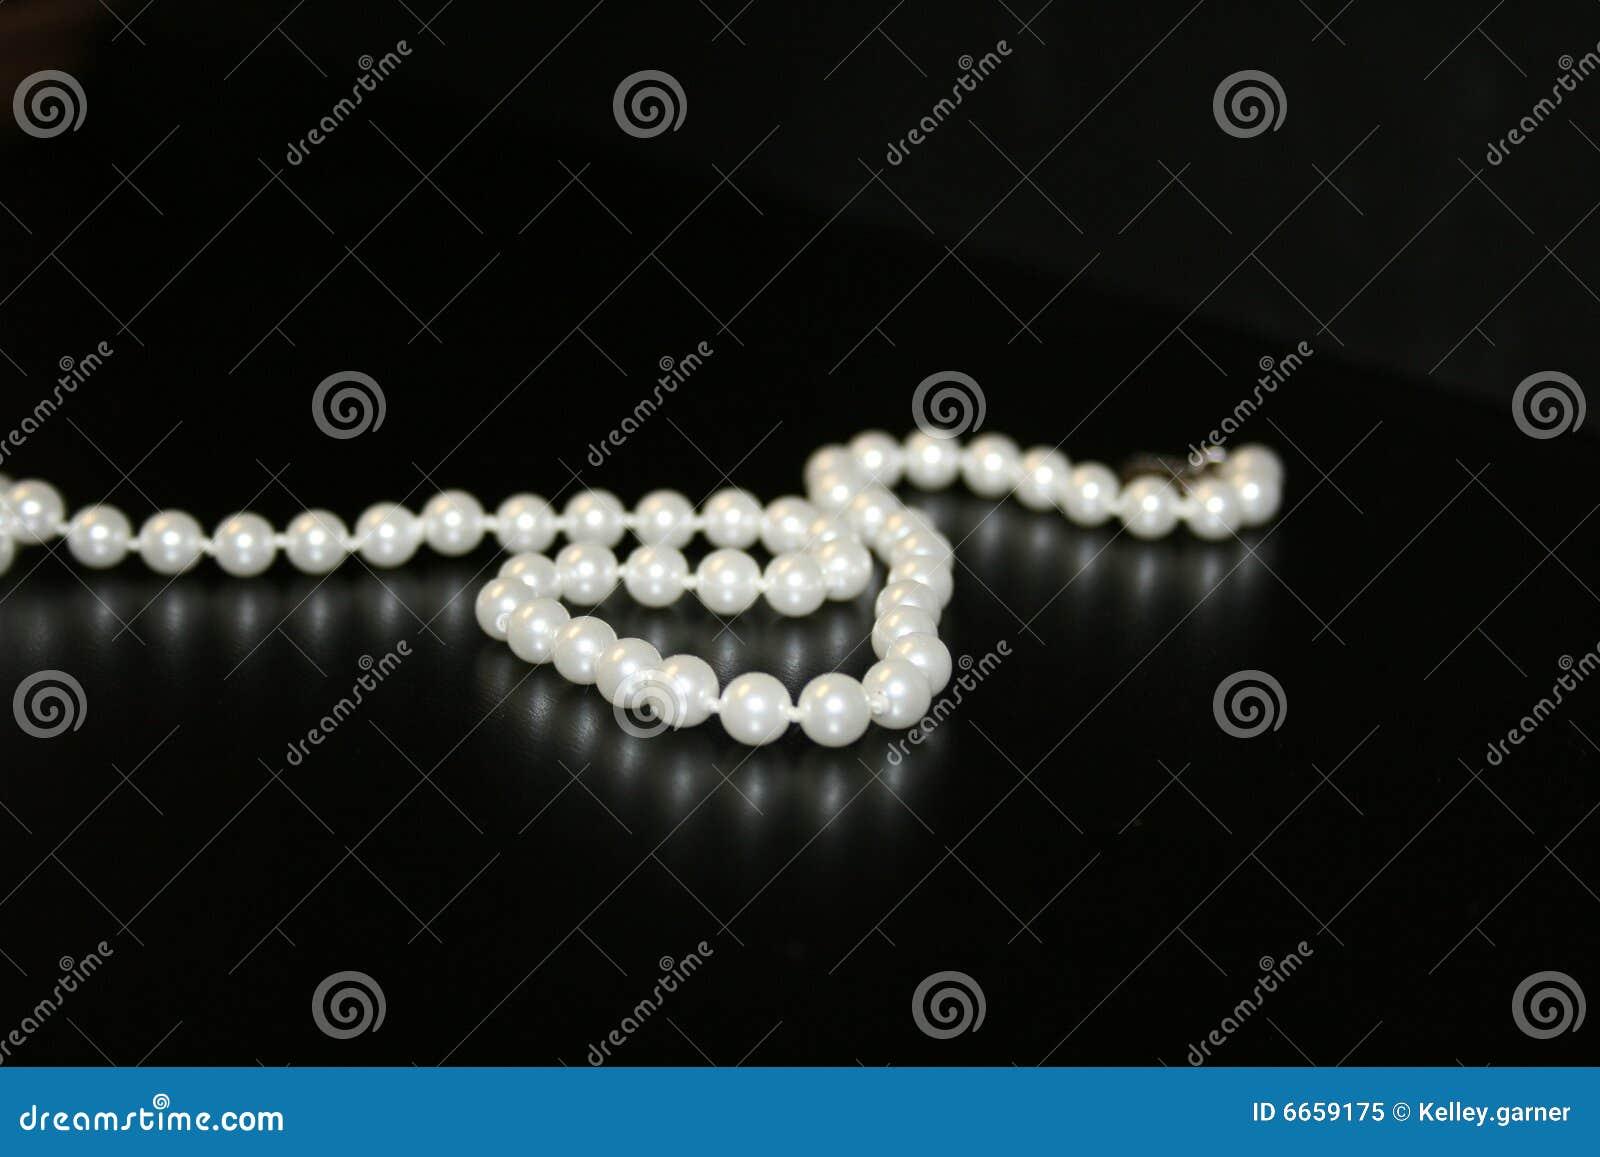 Chaîne de caractères des perles